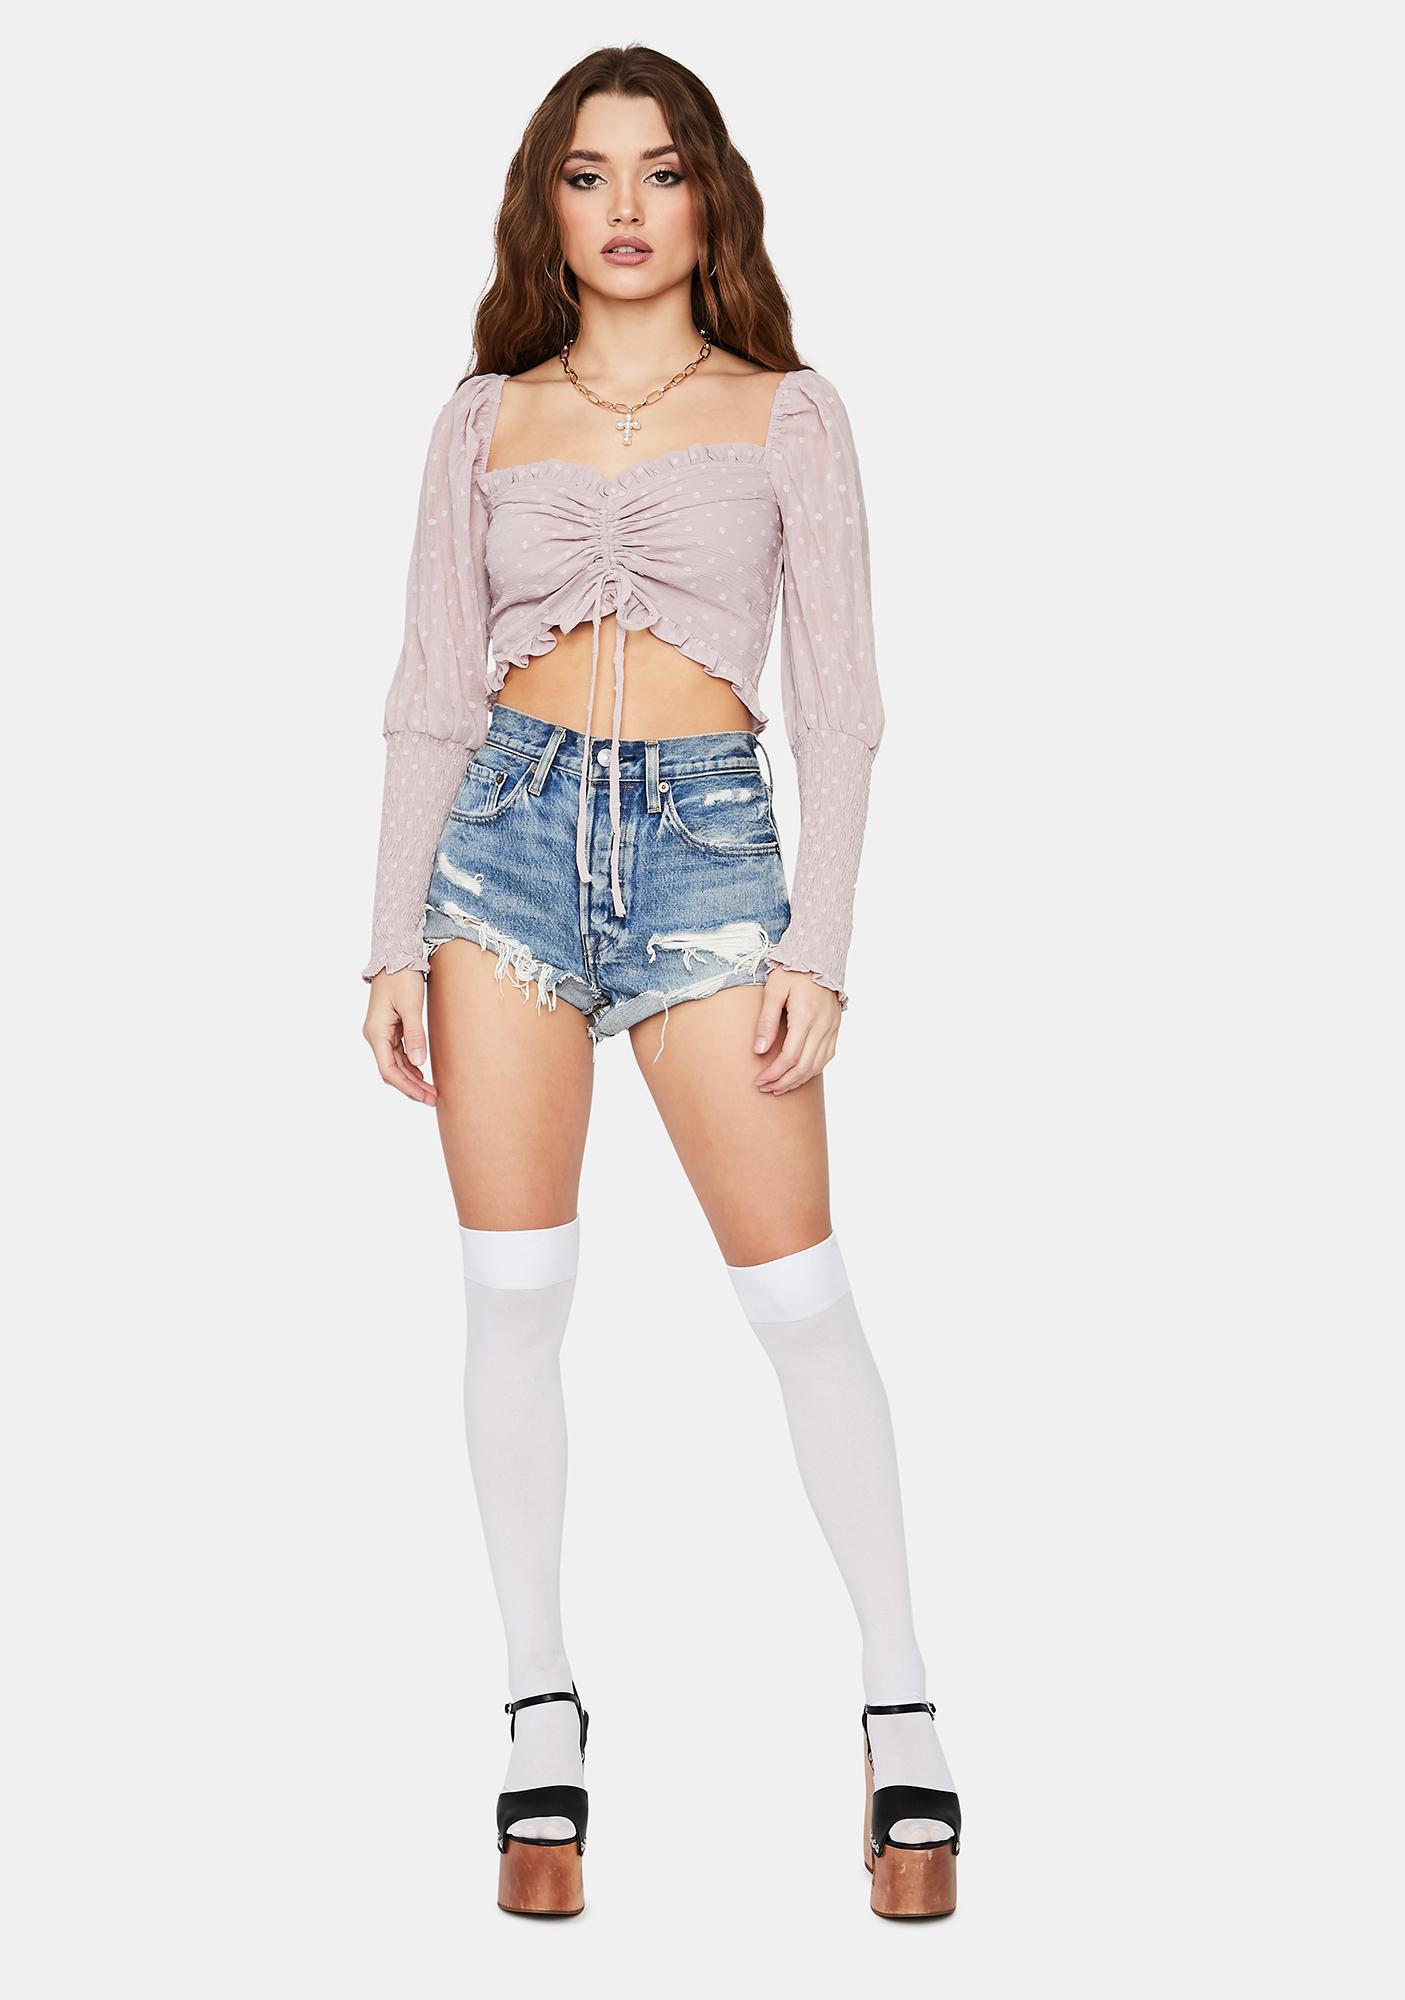 Lilac Not So Secret Tie Crop Top